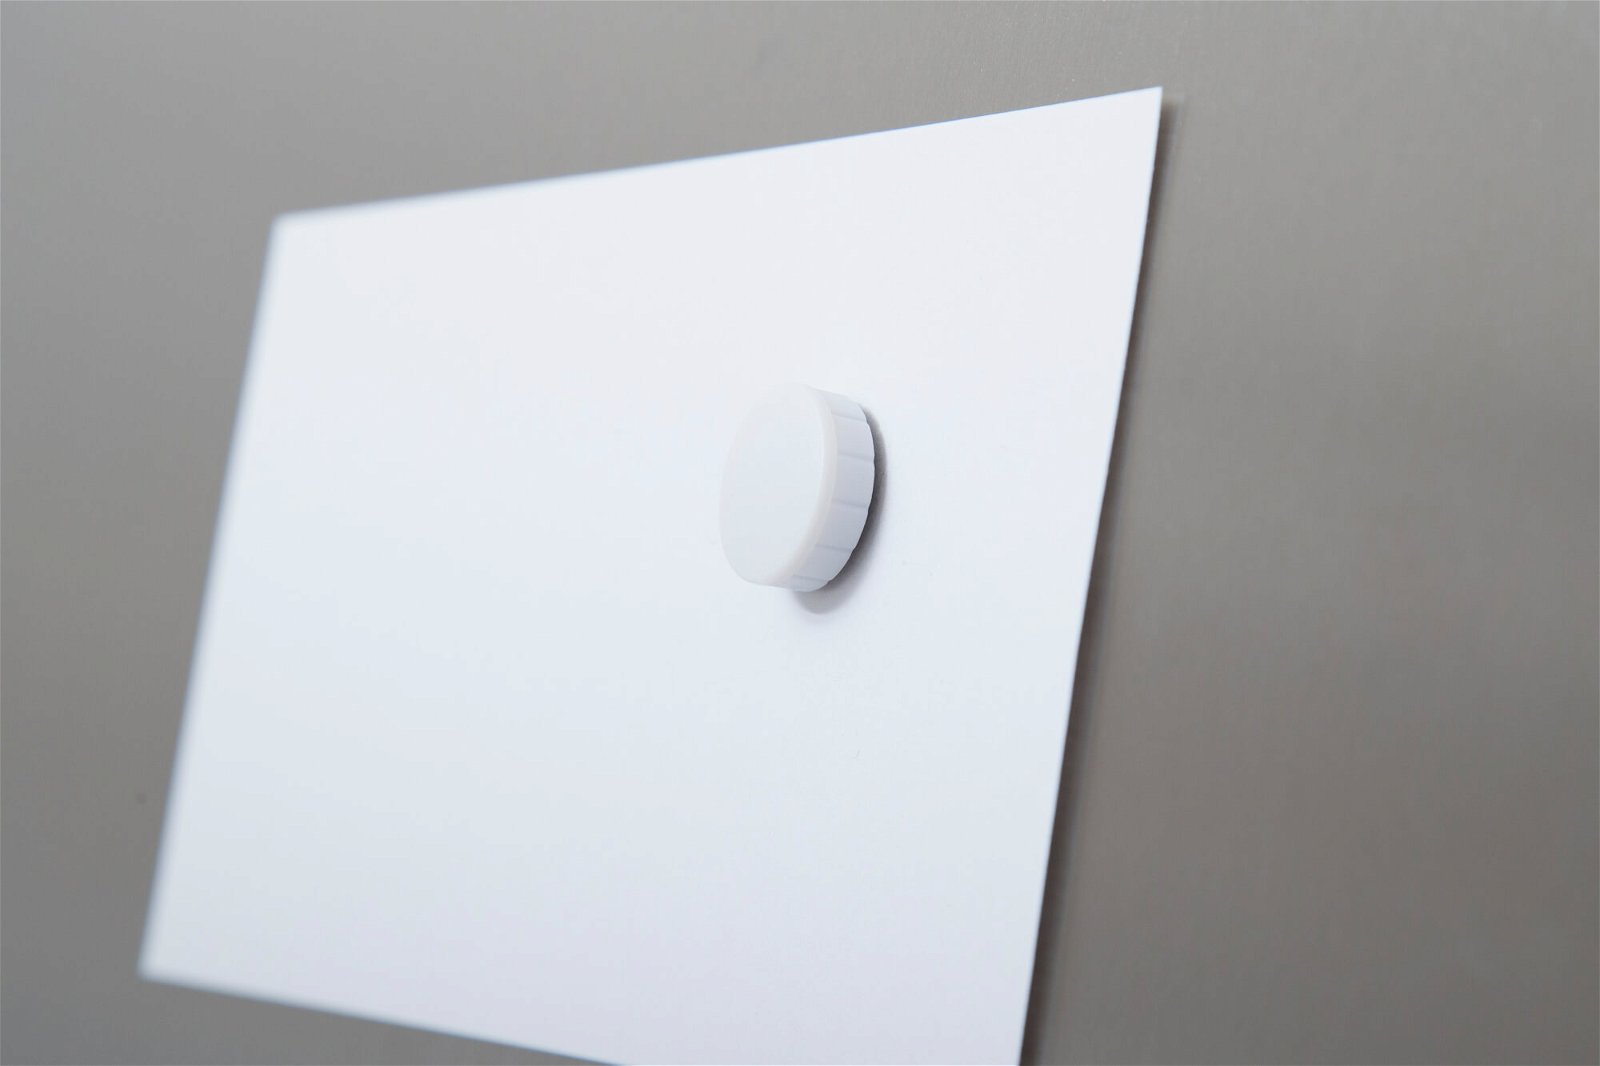 Magnet MAULsolid Ø 20 mm, 0,3 kg Haftkraft, 10 St./Ktn., weiß